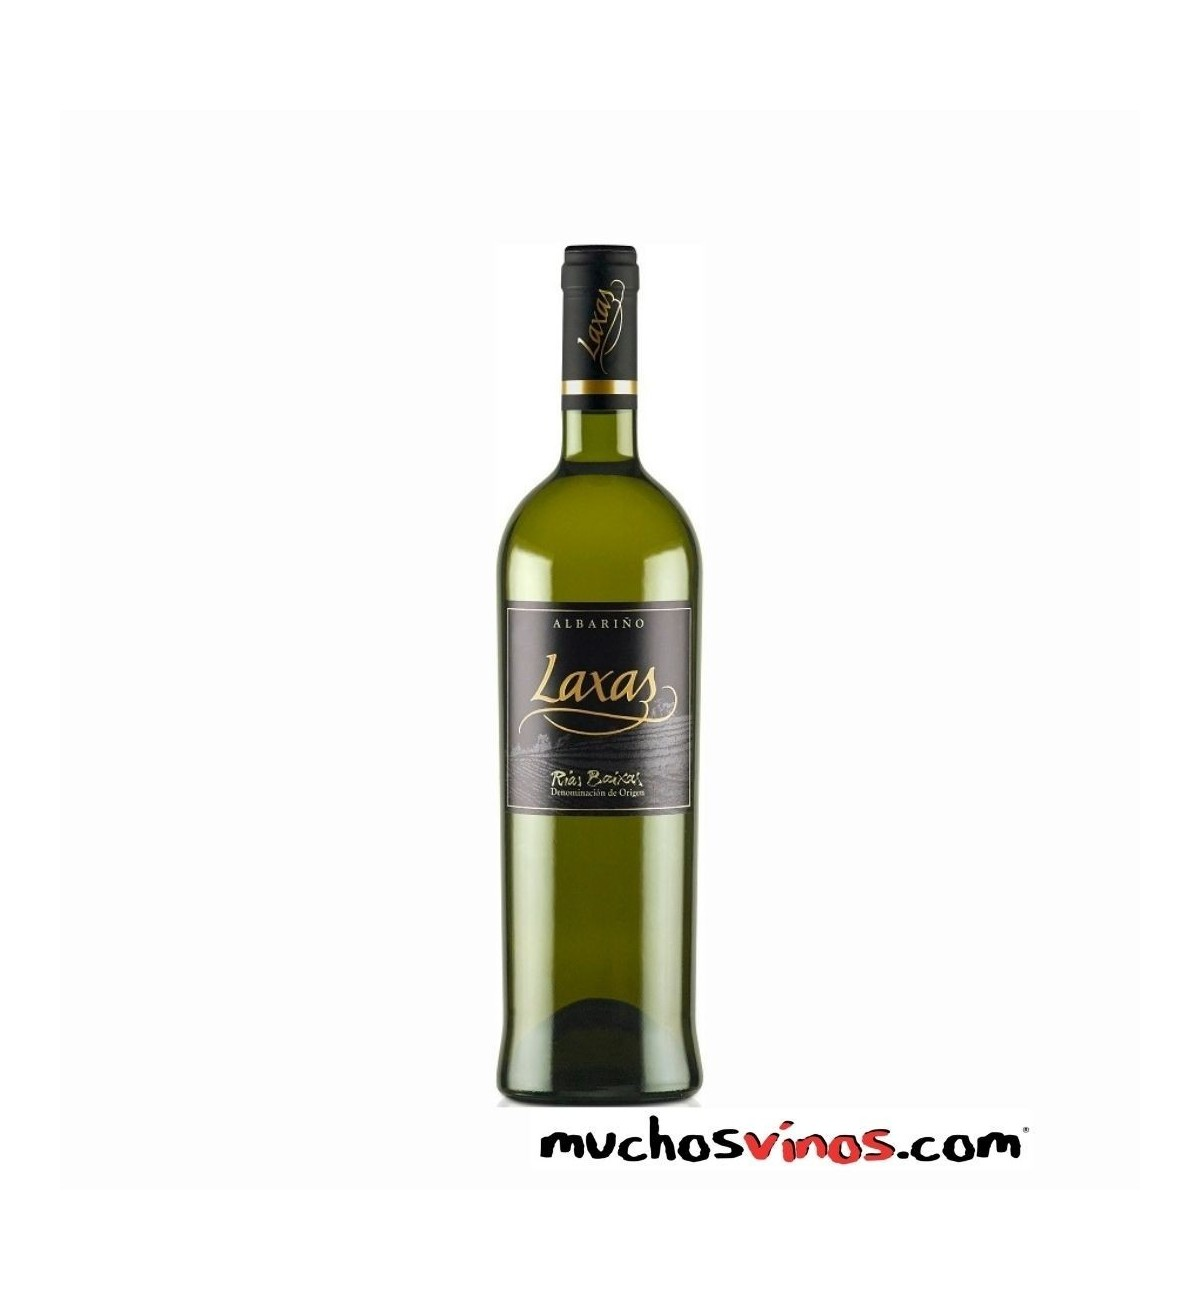 Laxas - Albariño - Rías Baixas - MuchosVinos.com